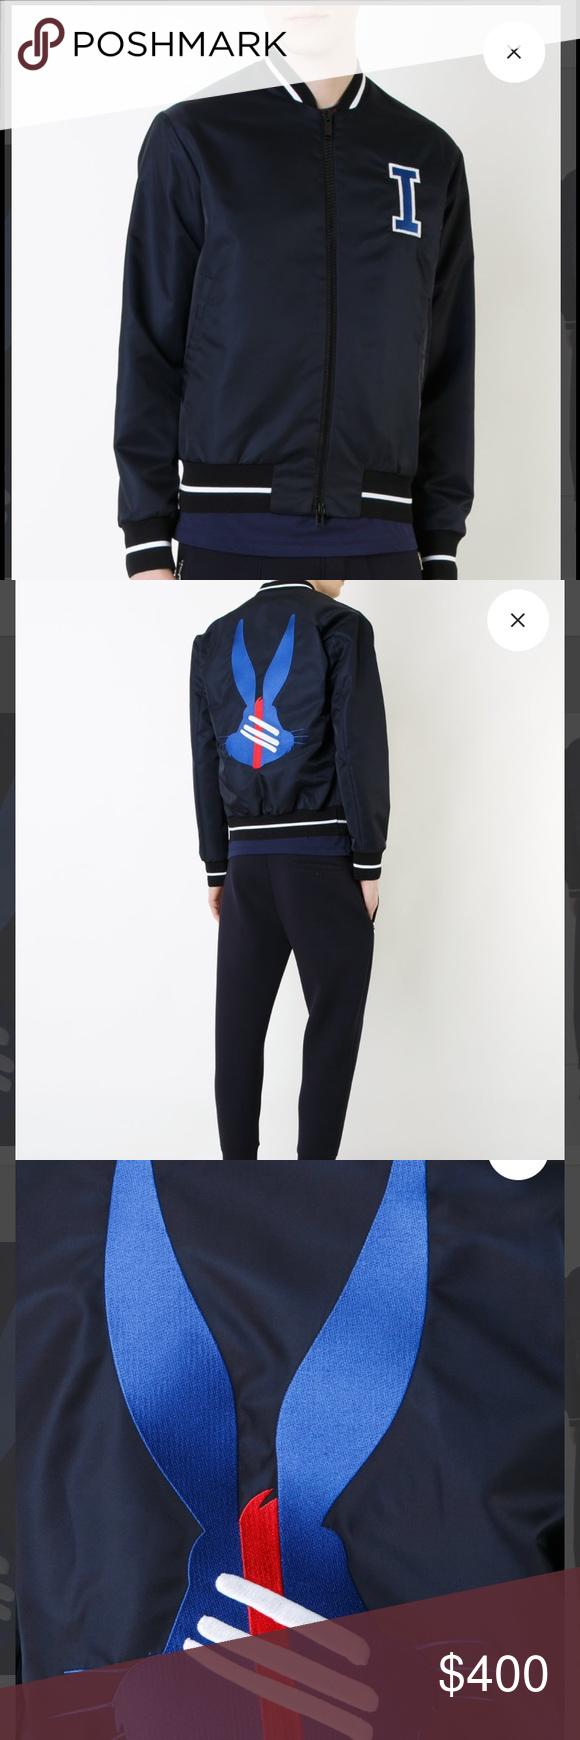 Iceberg Bomber Jacket Purchased At Kith Miami Jackets Bomber Jacket Clothes Design [ 1740 x 580 Pixel ]